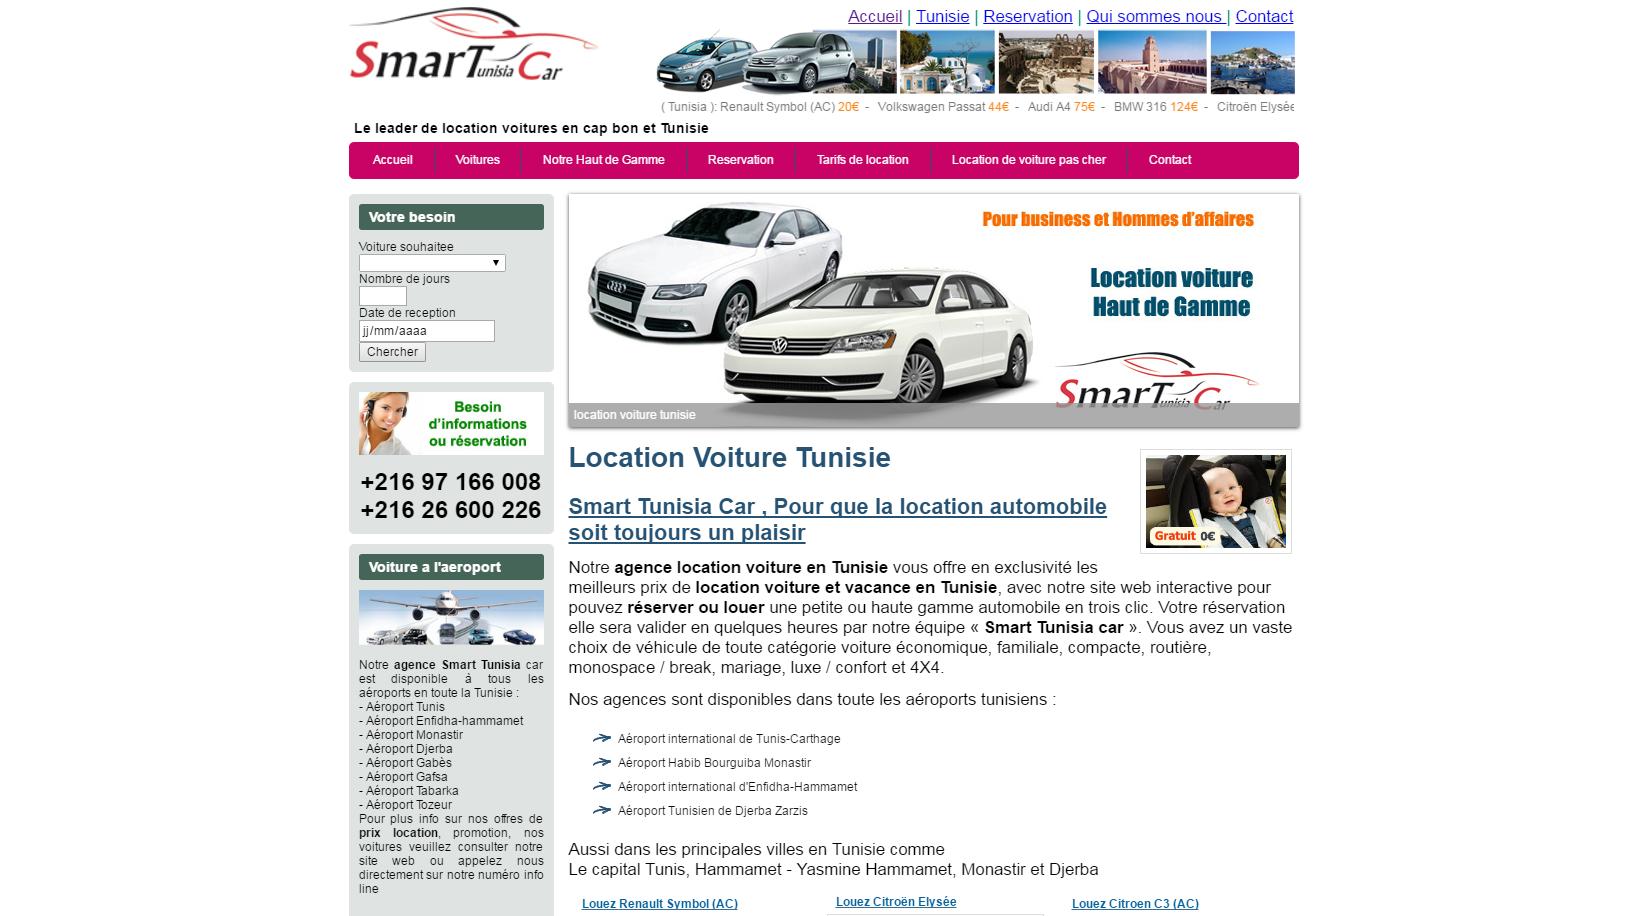 smart tunisia car correction site location voiture tunisie hammamet informatique services. Black Bedroom Furniture Sets. Home Design Ideas